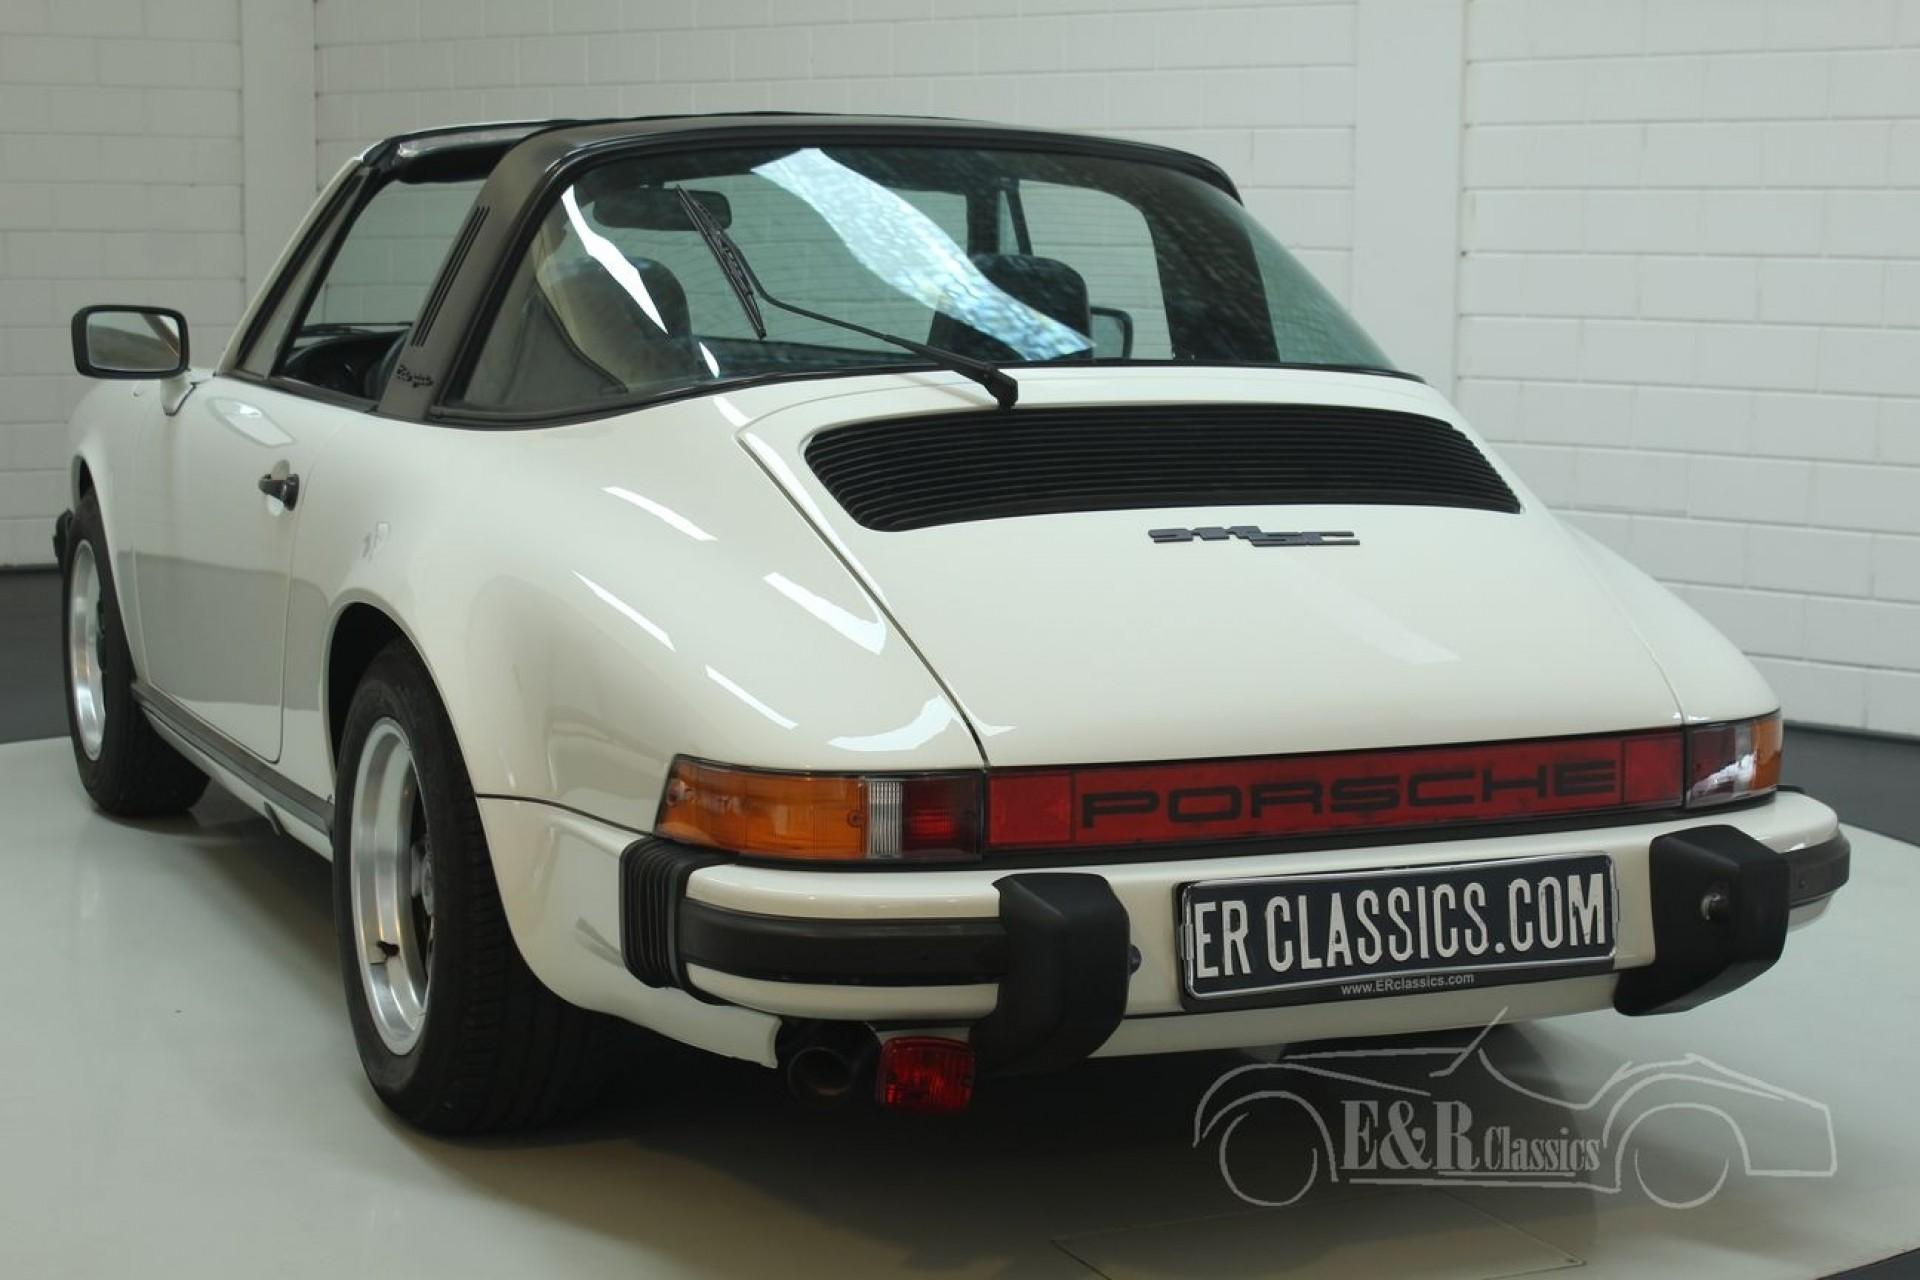 Porsche 911 SC Targa 1979 for sale at Erclassics